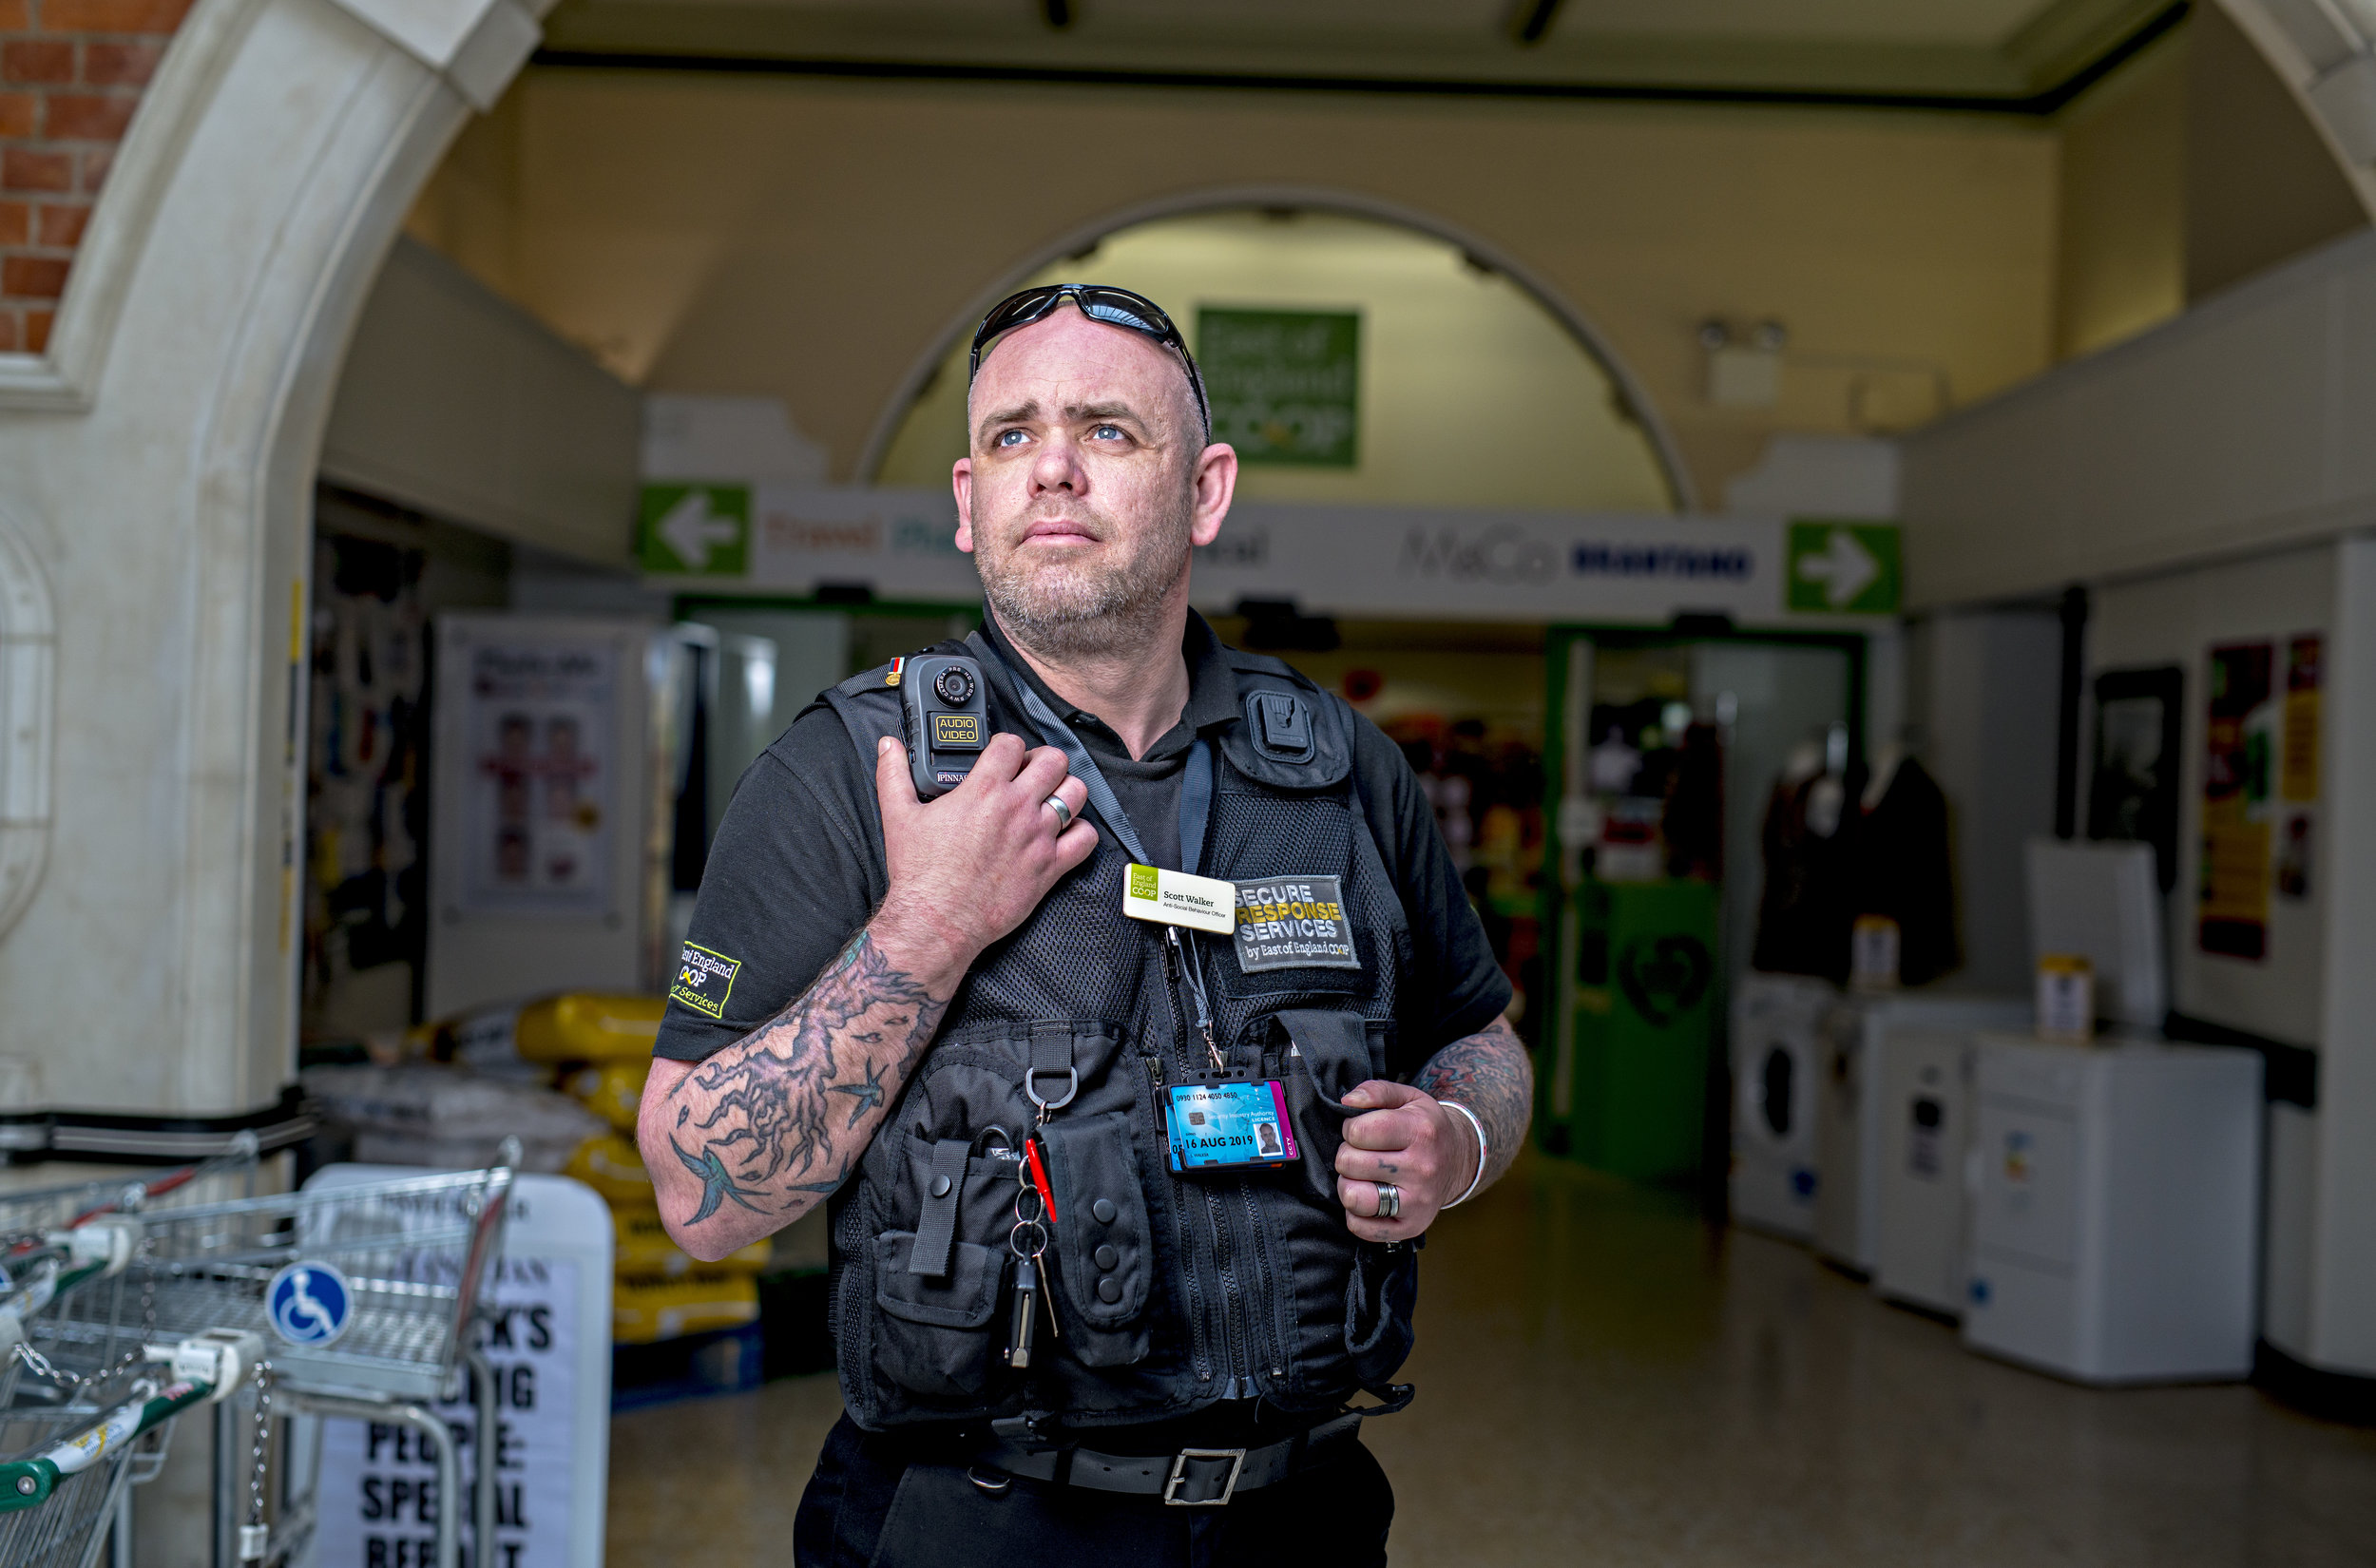 Scott Walker Security co-ordinator for the E of E Co-Op's Felixstowe Store